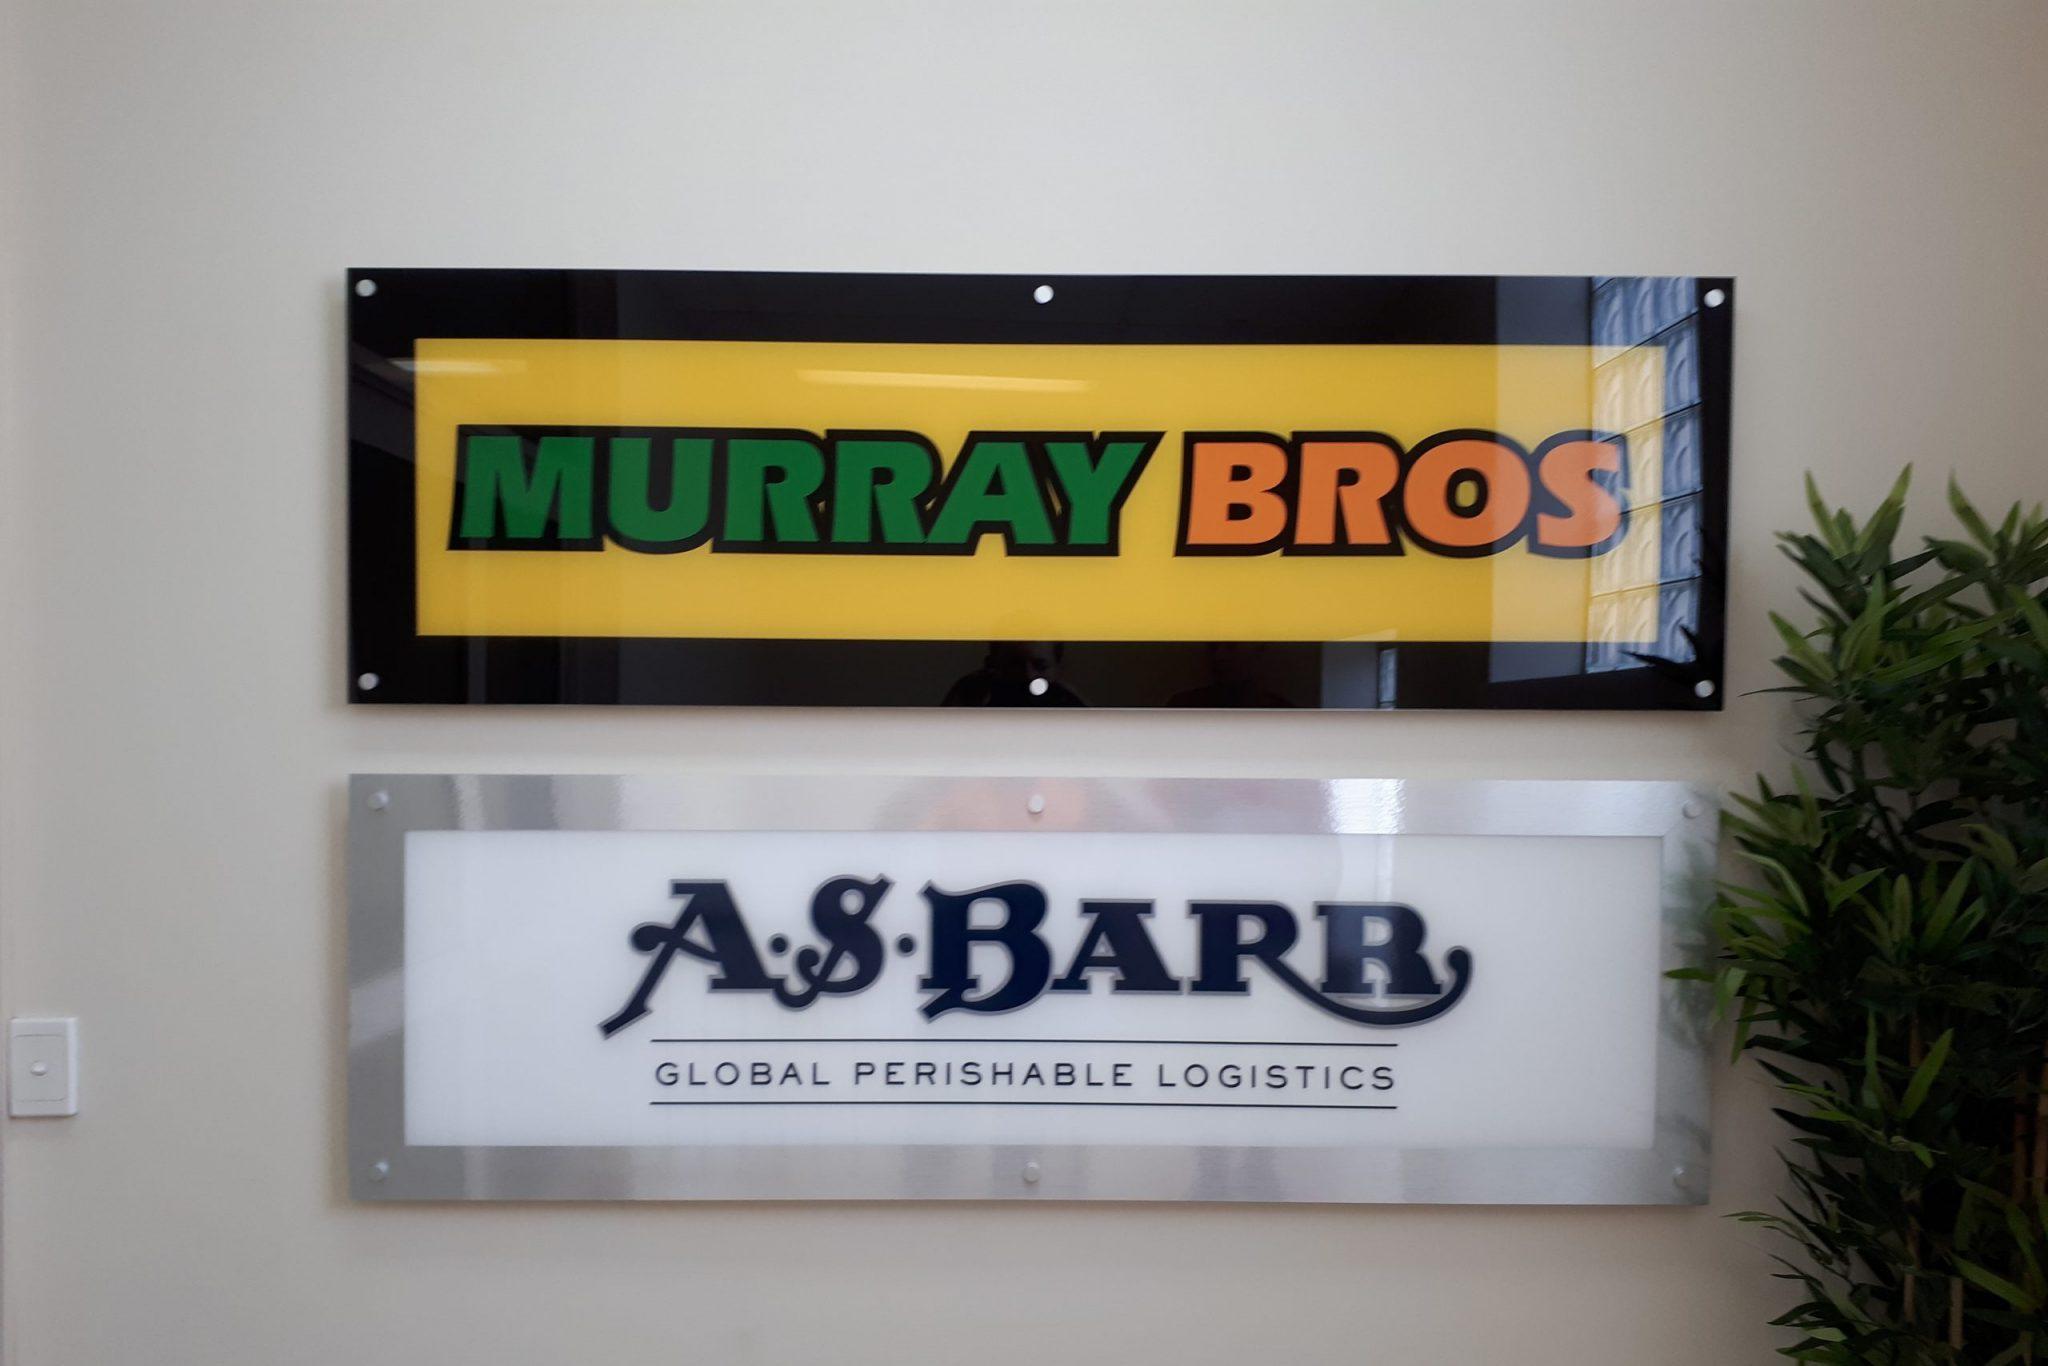 Murray Bros